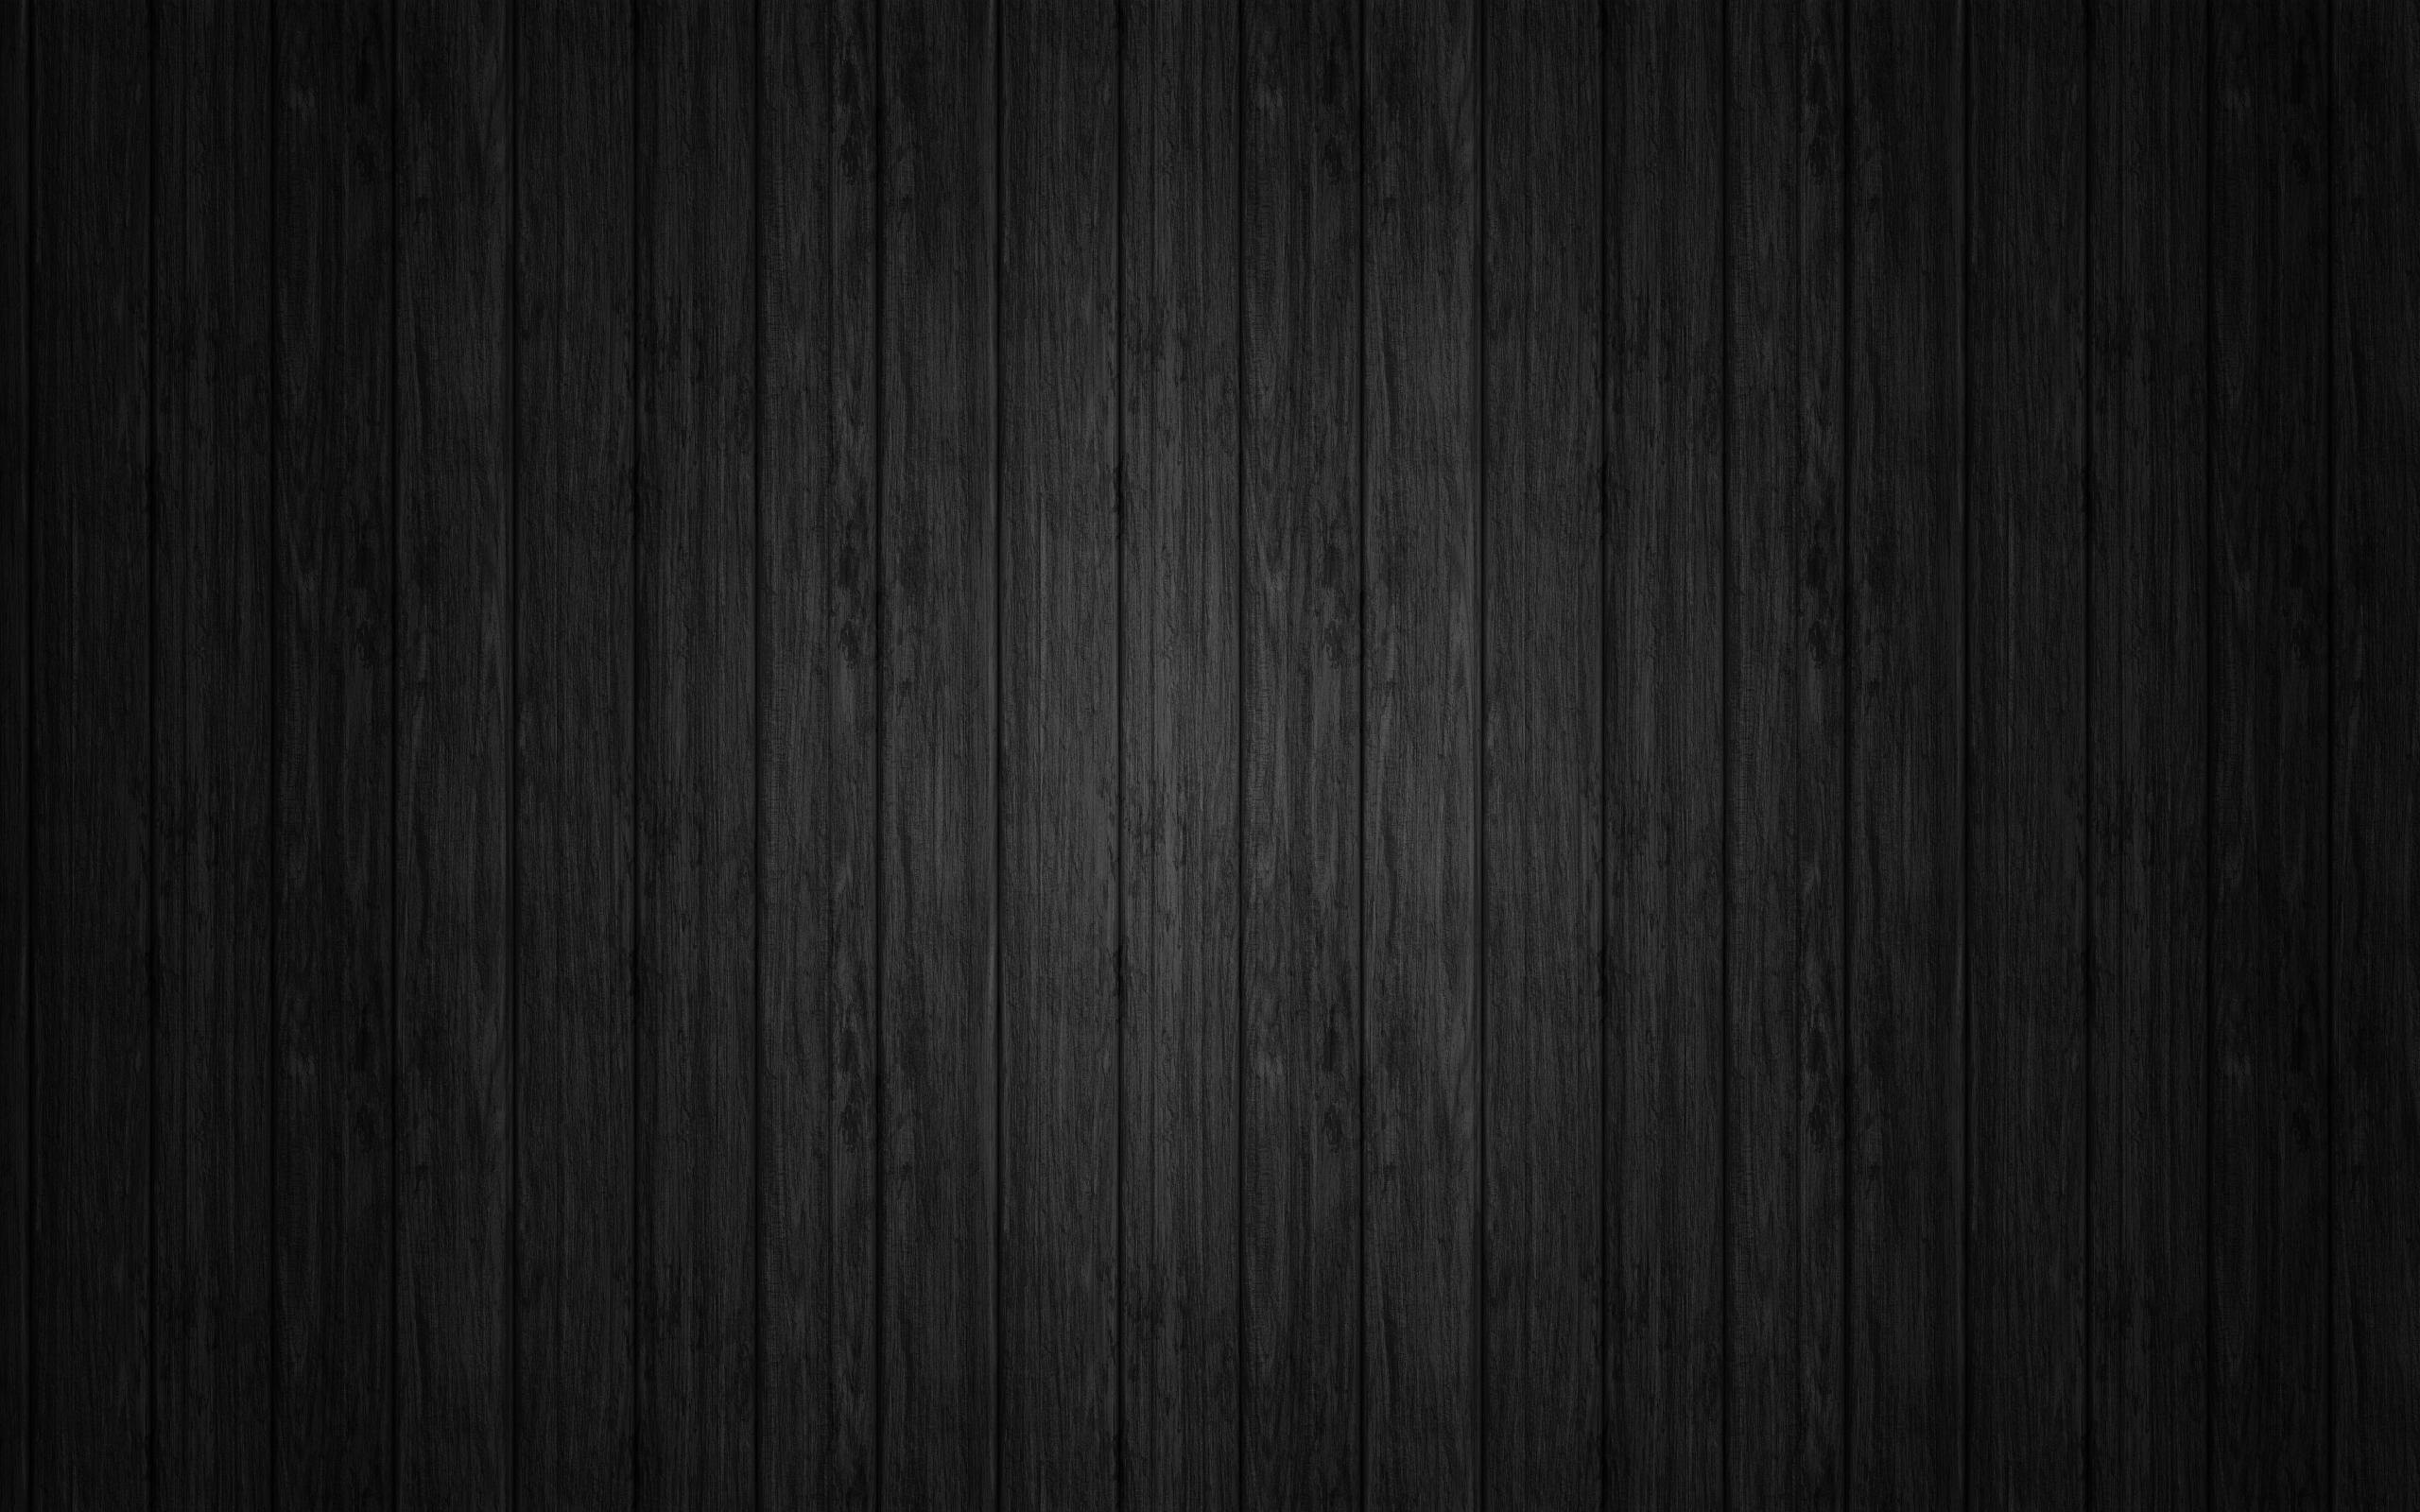 Waves Wallpaper 2560x1600 8712